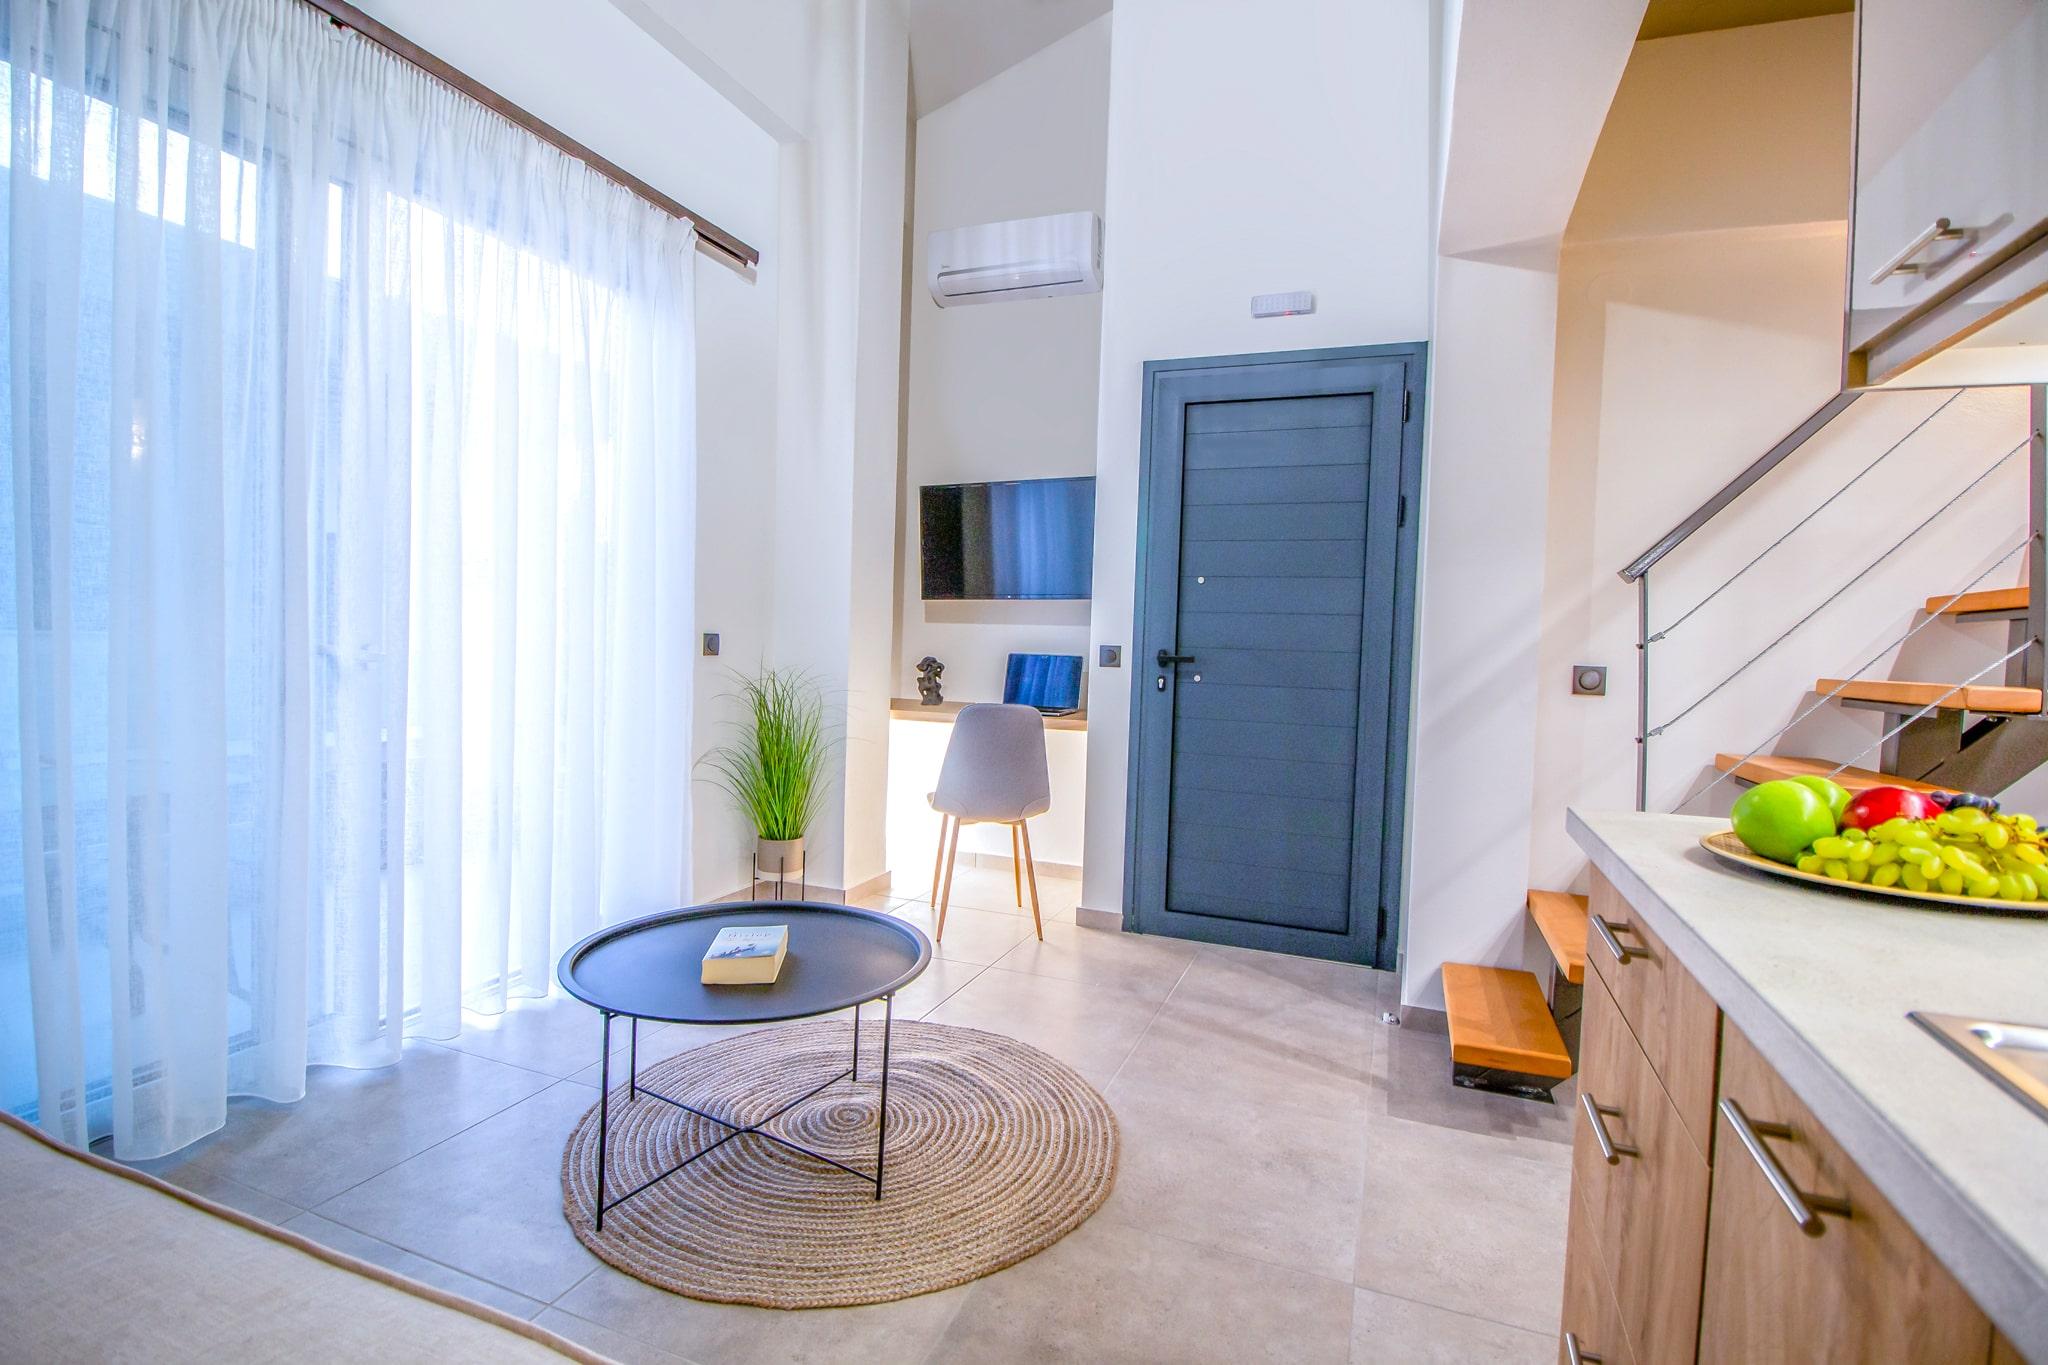 aelia suites living room